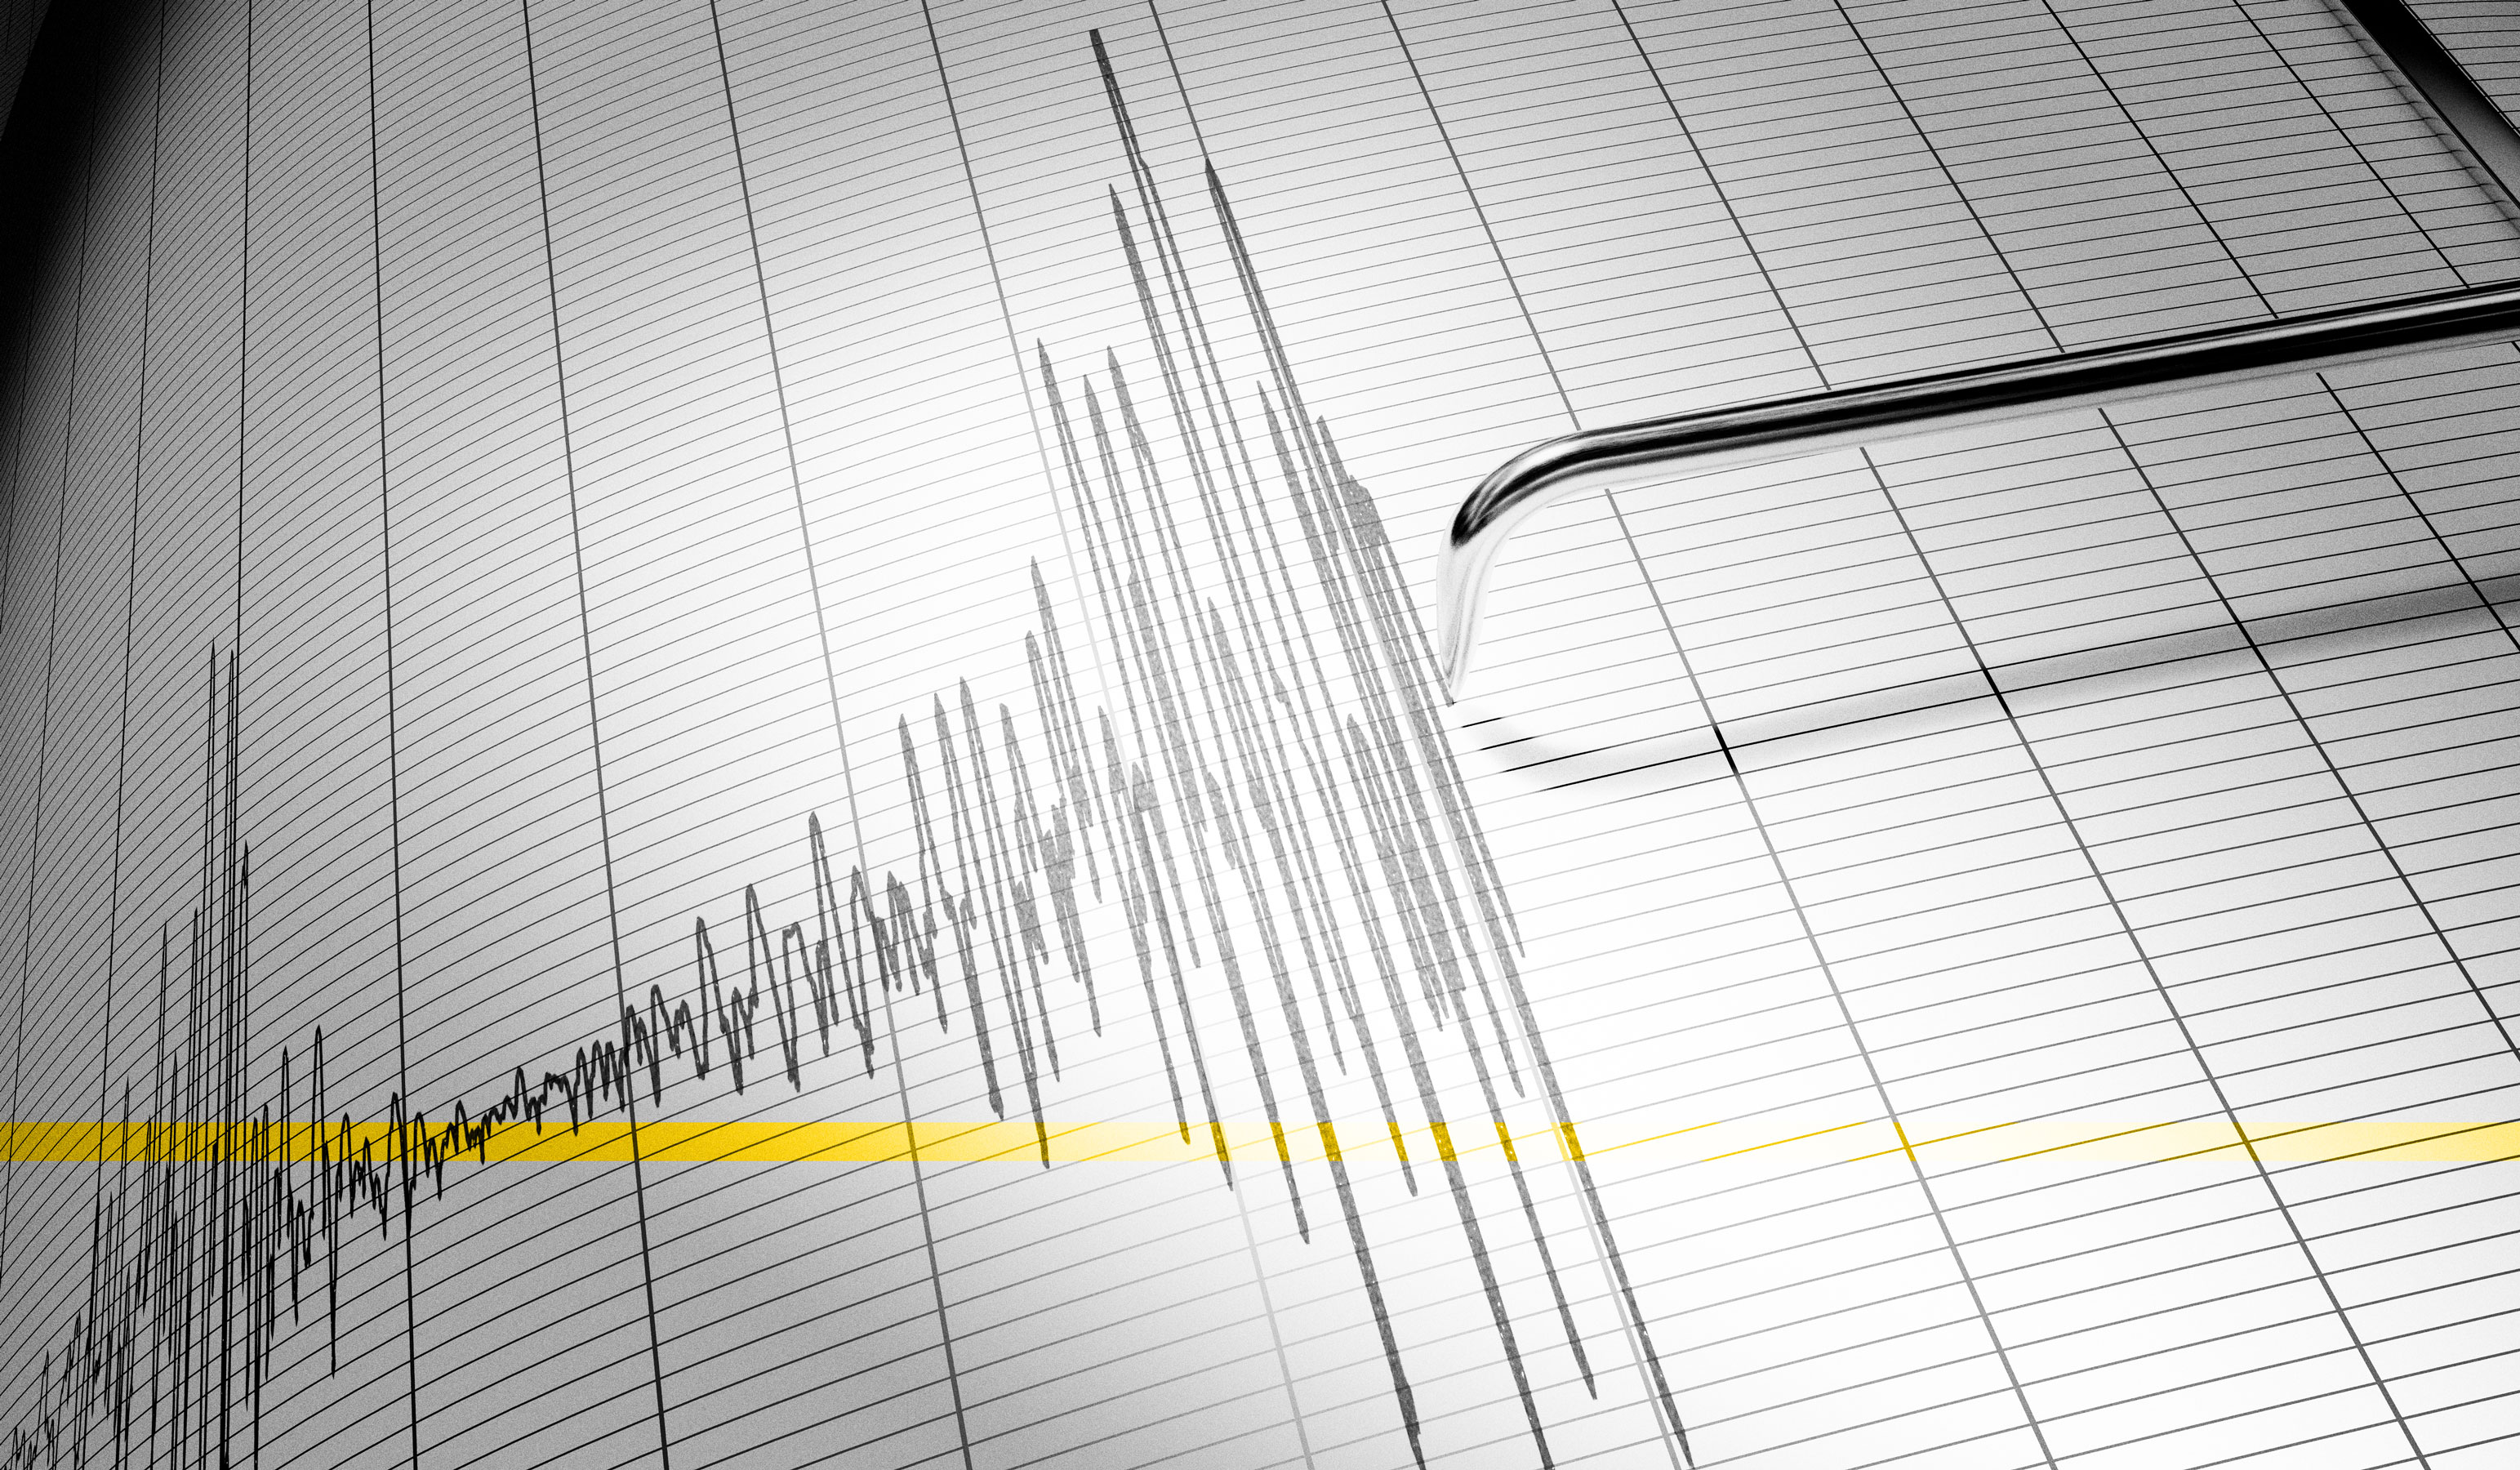 A 6.5 magnitude quake shook up Idaho Tuesday afternoon